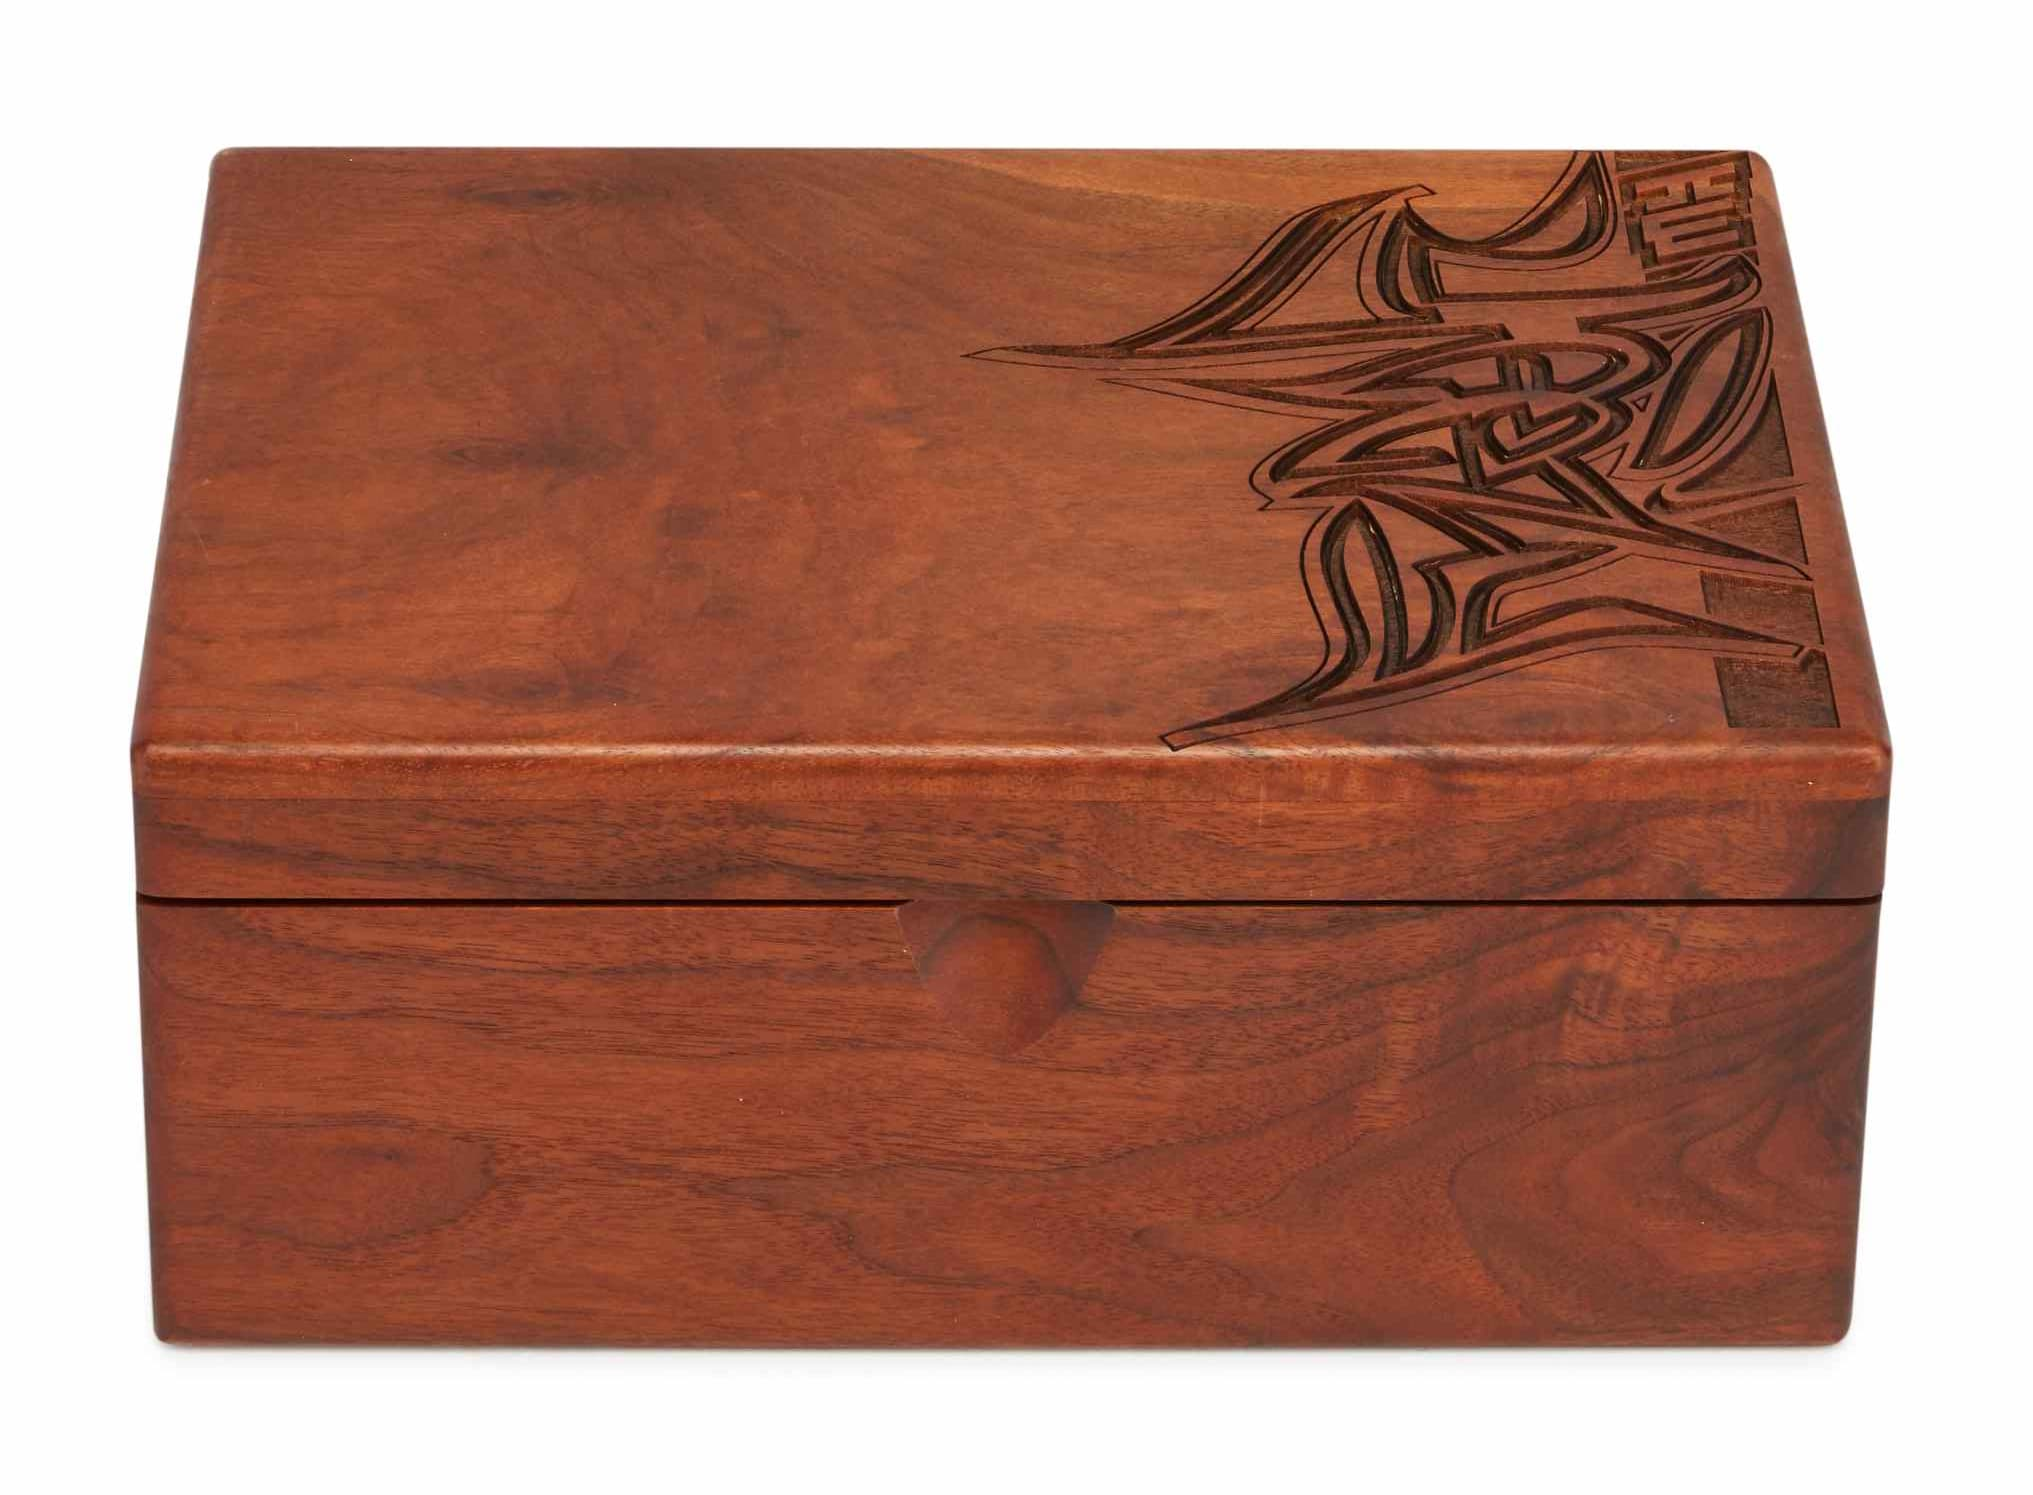 Nike Air Yeezy 1 Grammy's Sample Box